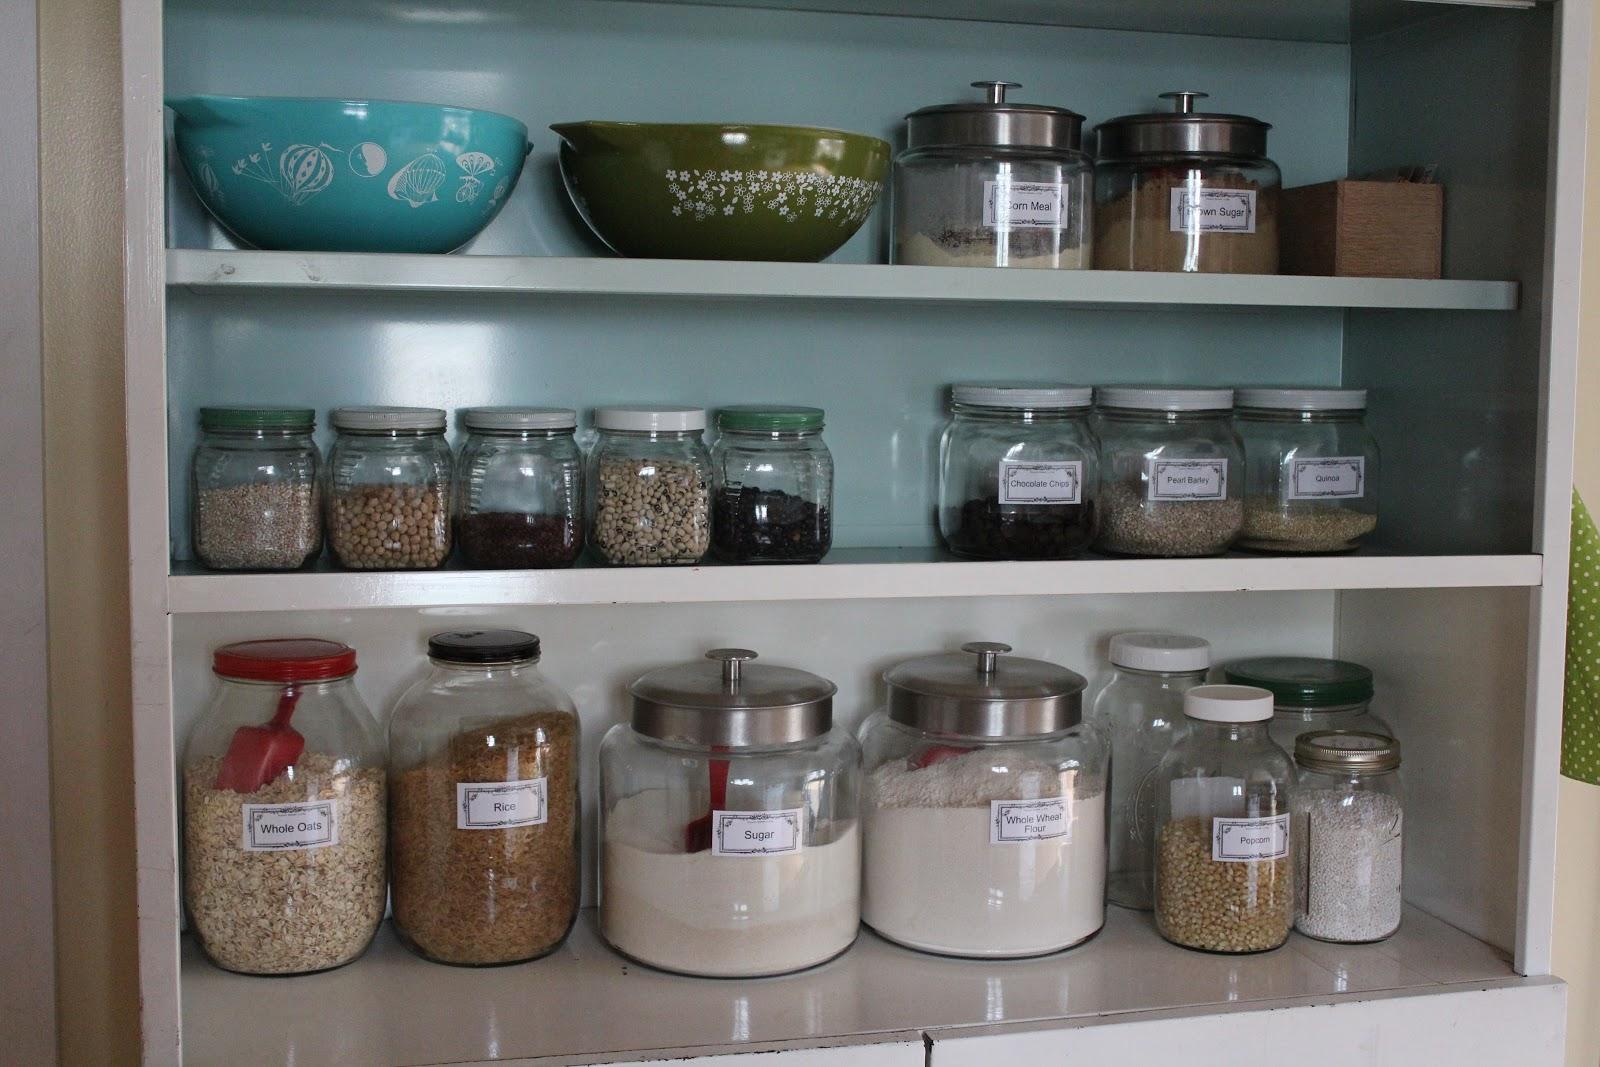 Strangers Pilgrims On Earth Tidy Baking Pantry Inspiration Pantry Series